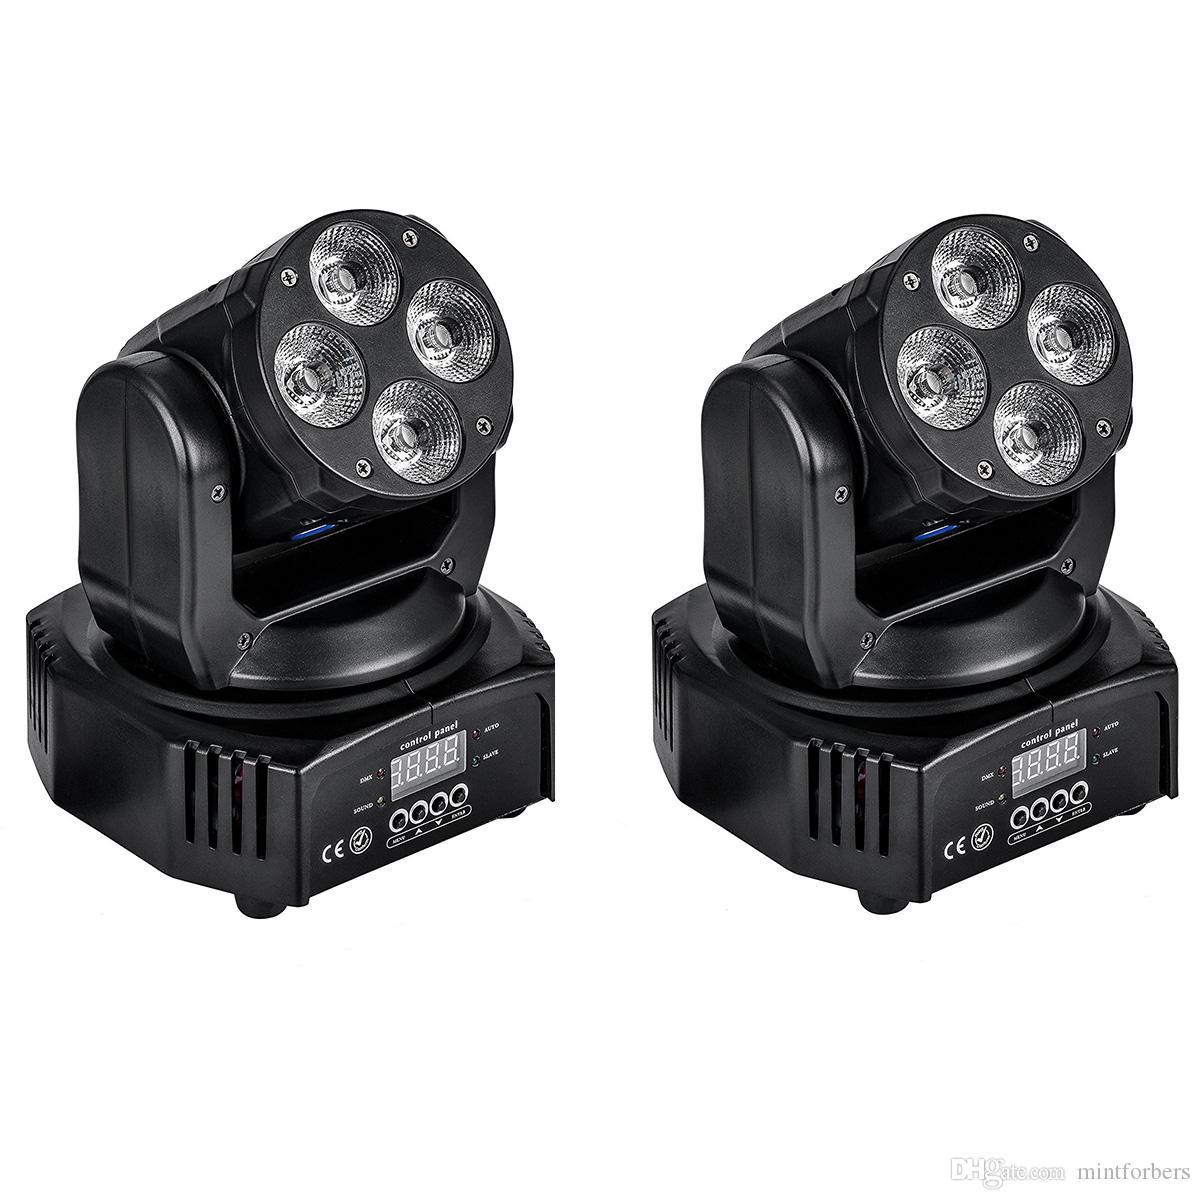 2018 4x10w Mini Led Moving Head Wash Light Dmx512 Rgbwa+Uv 6in1 For ...